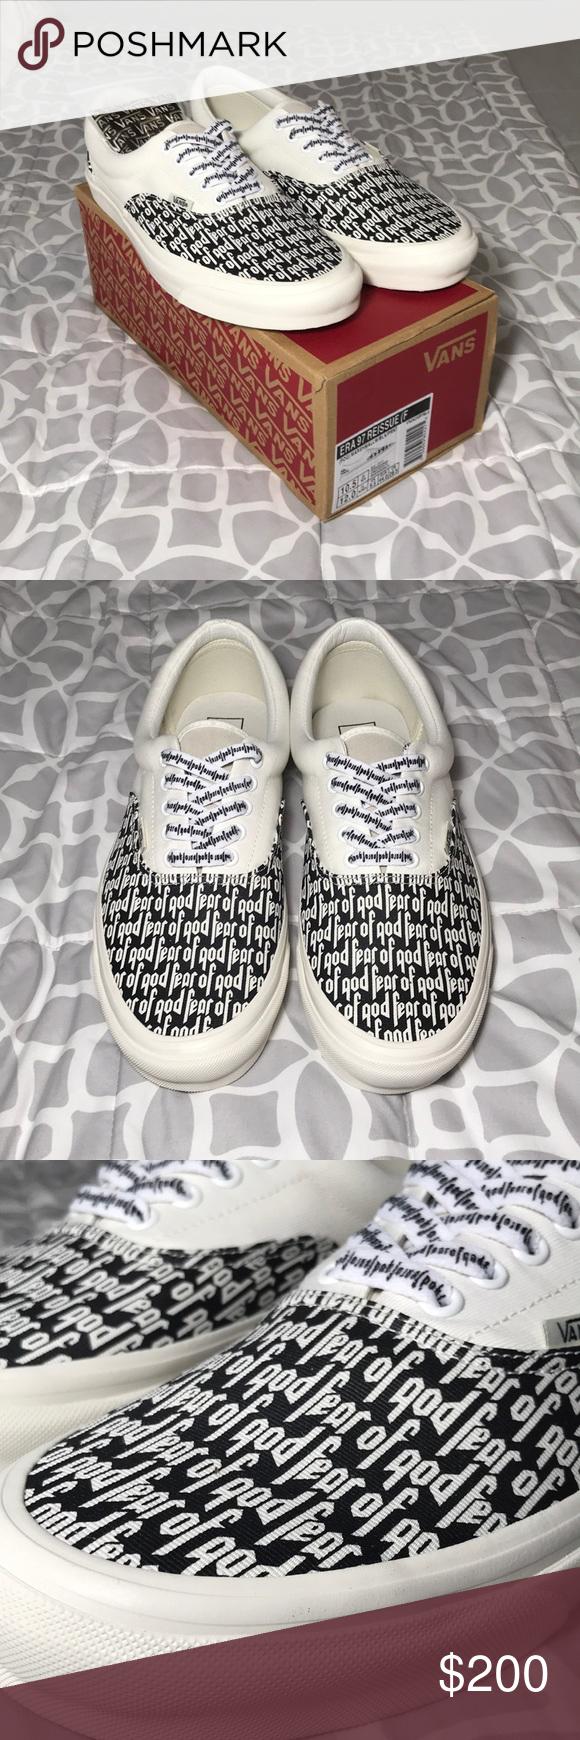 fear of god replica shoes